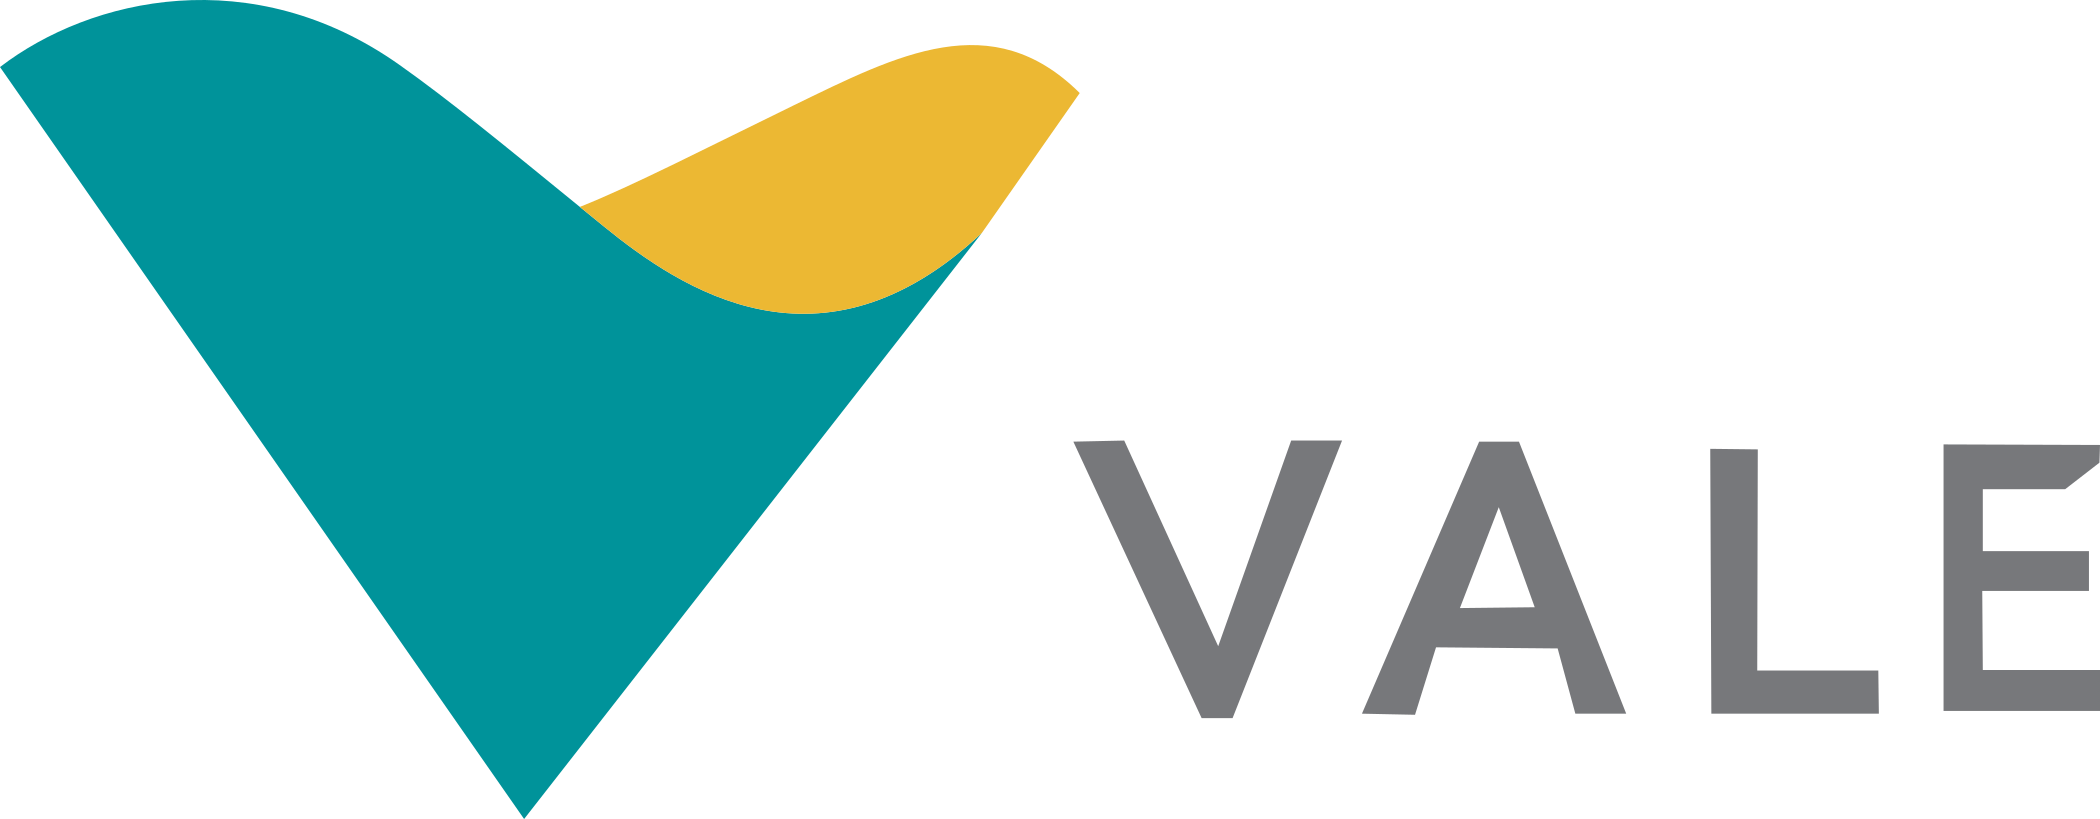 vale logo 1 1 - Vale Logo